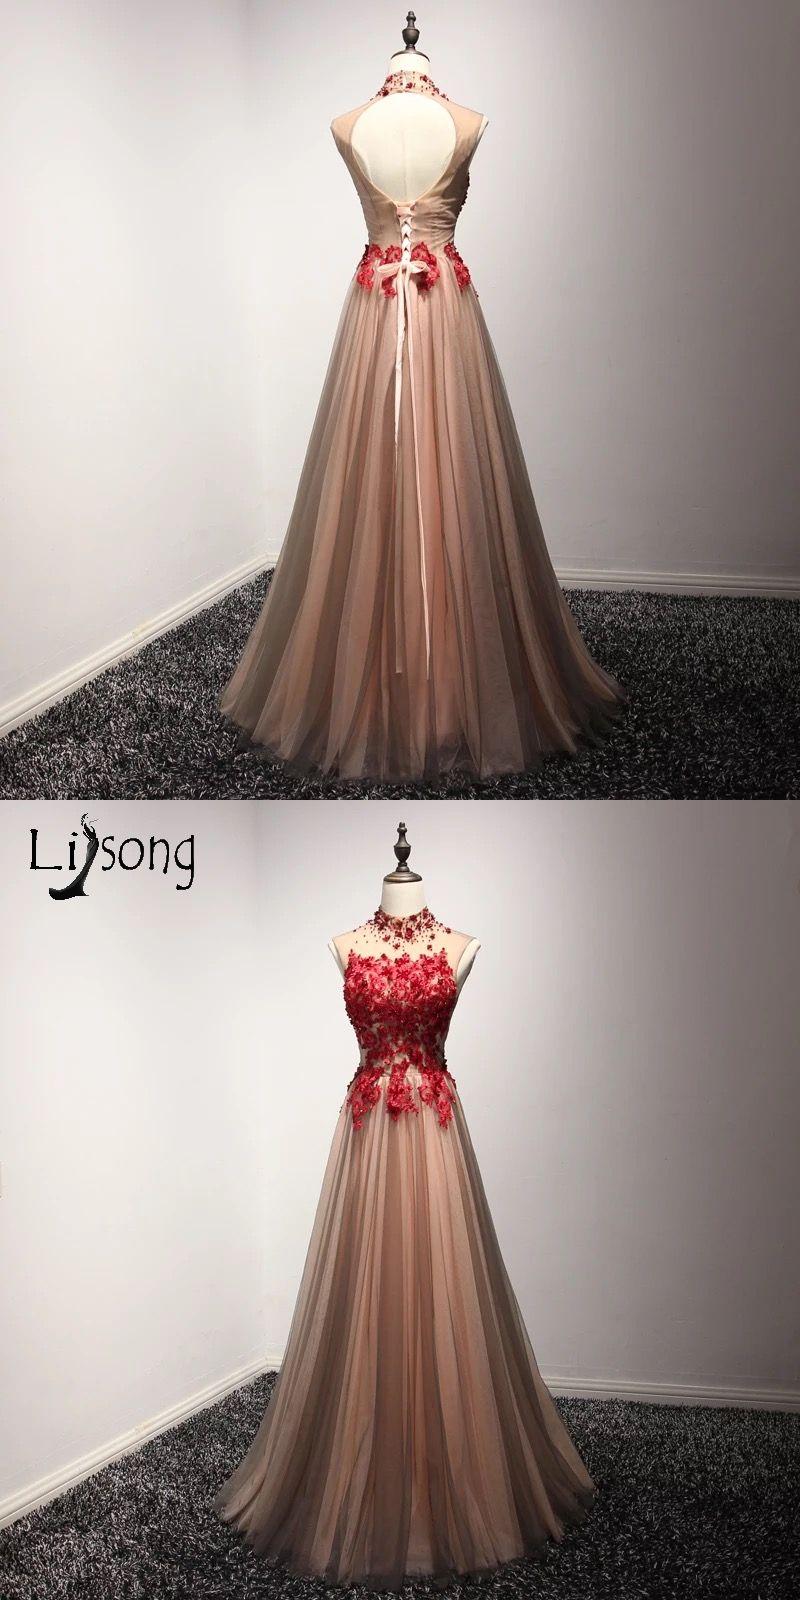 High neck red floral appliques evening dresses long vestido de noiva